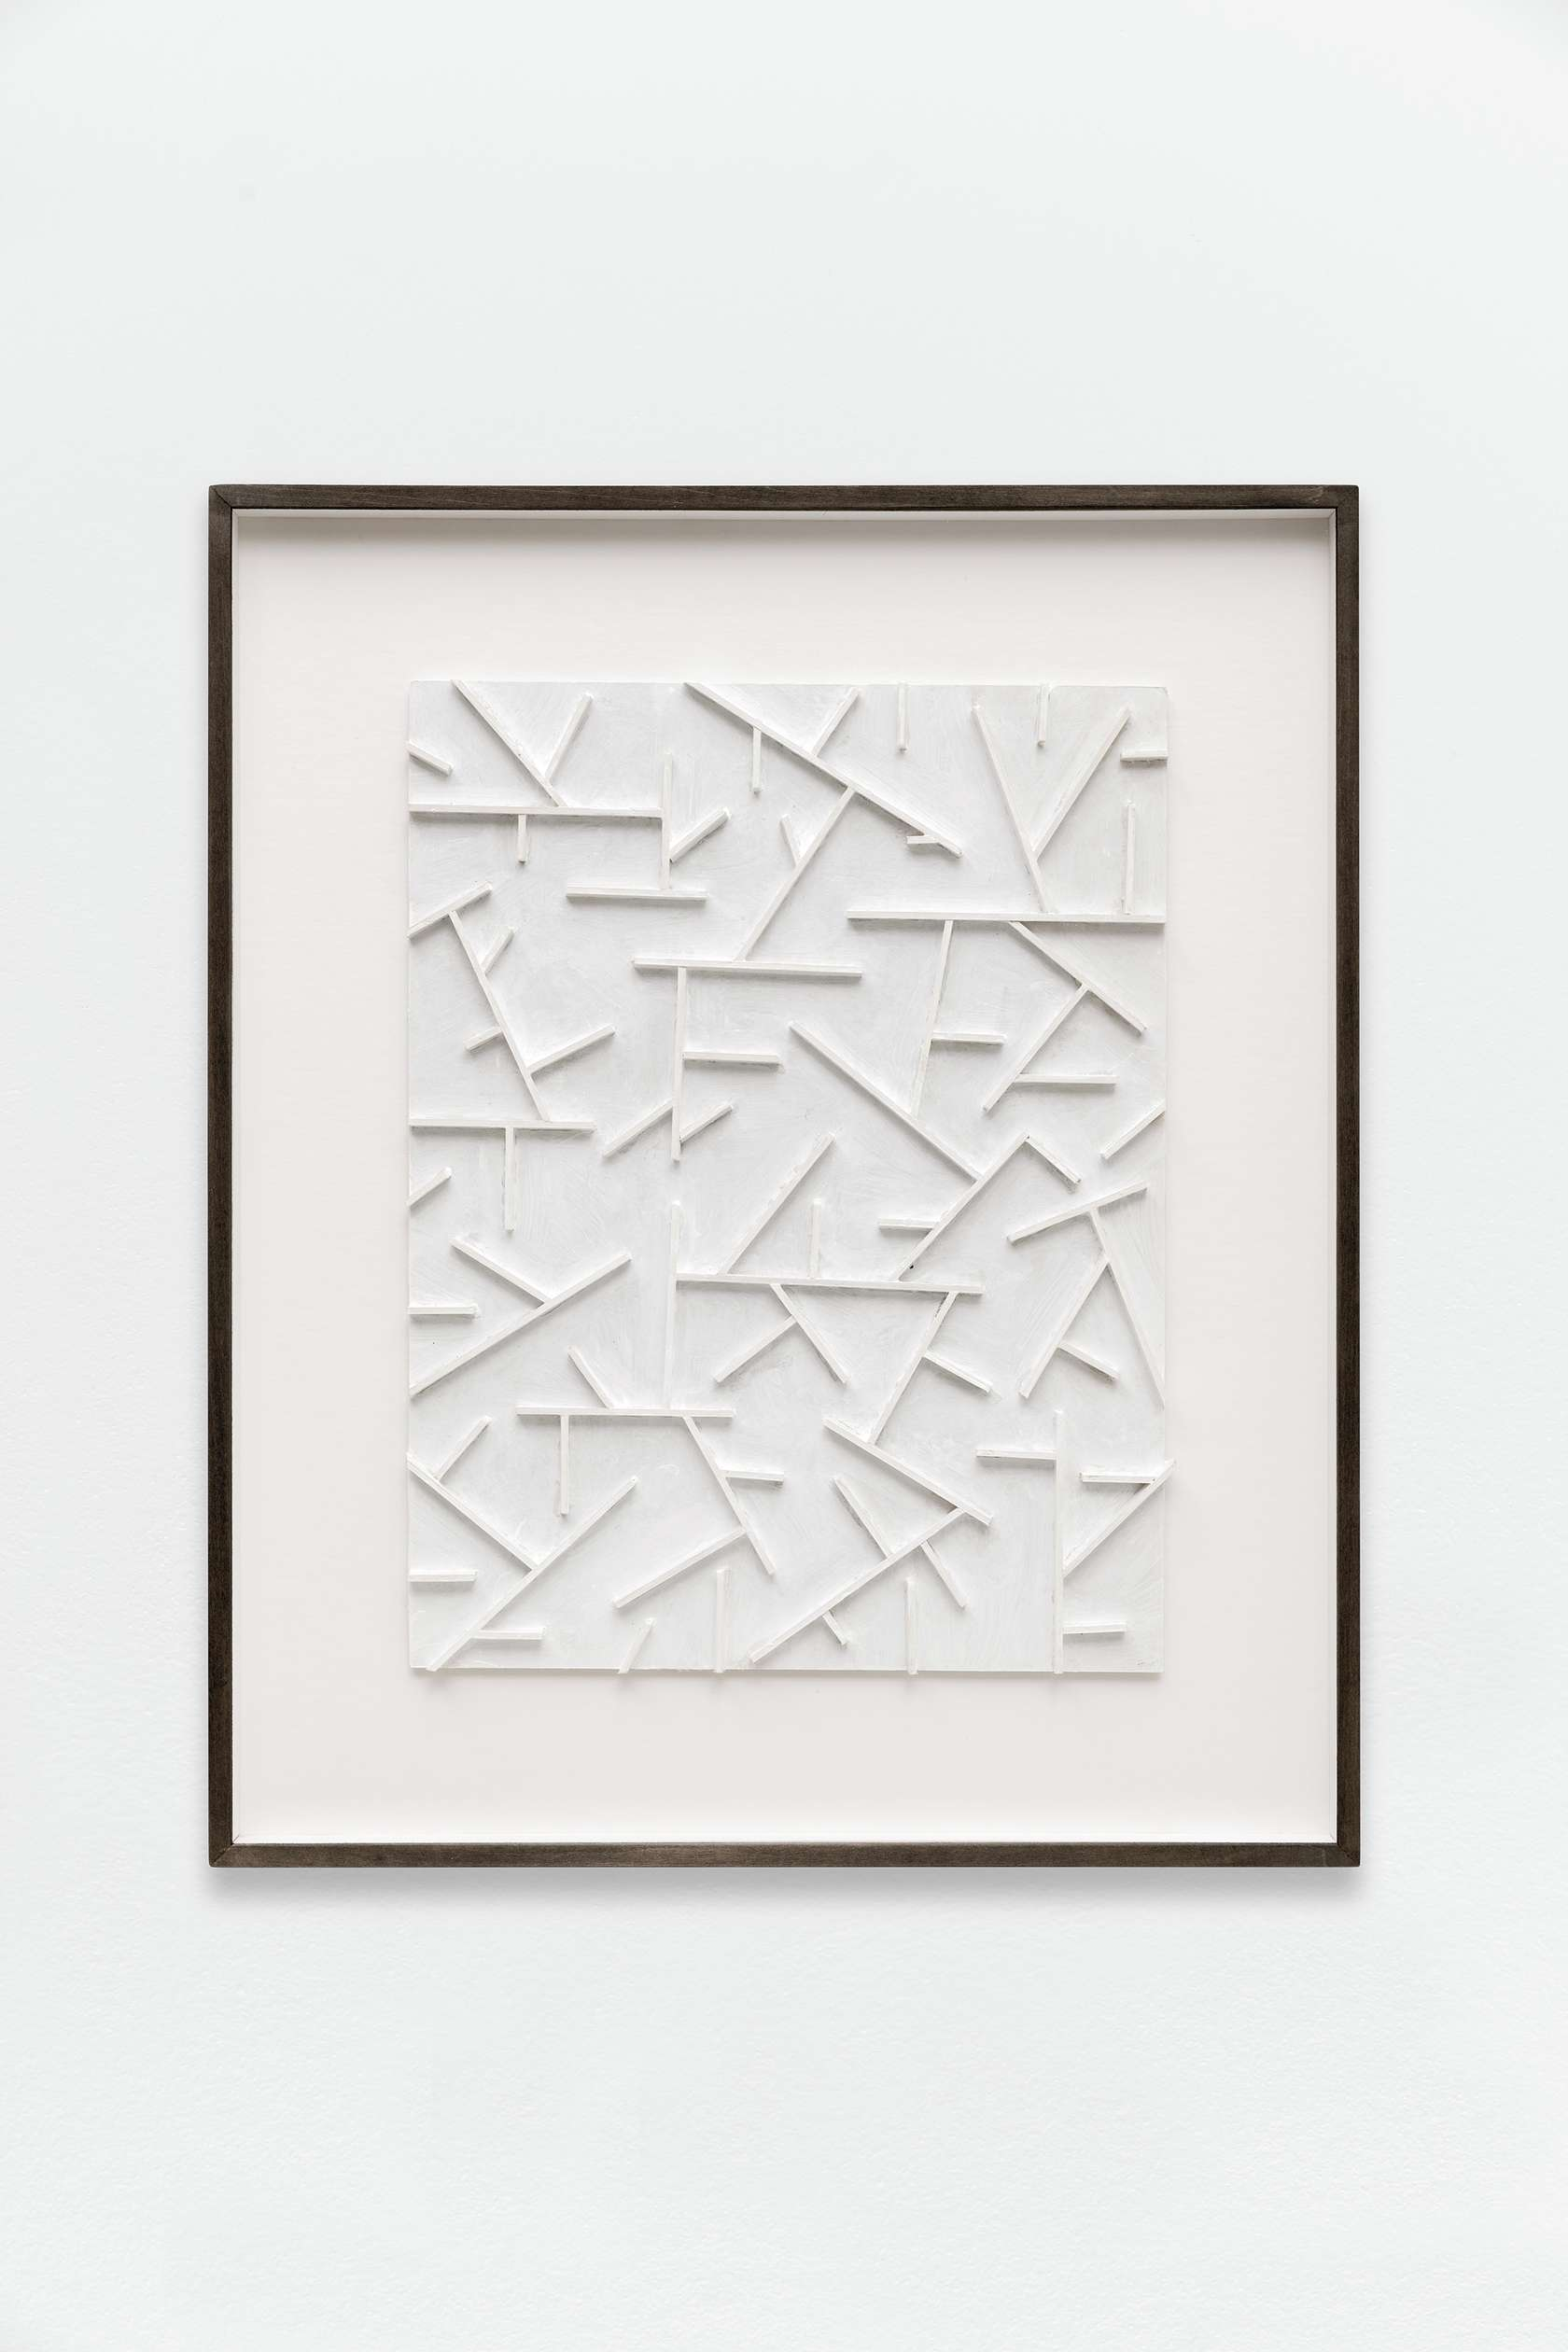 Beat Zoderer, Mashrabi 01, 2015 Bois et carton peints62.1 x 51.7 cm / 24 1/2 x 20 3/8 inches